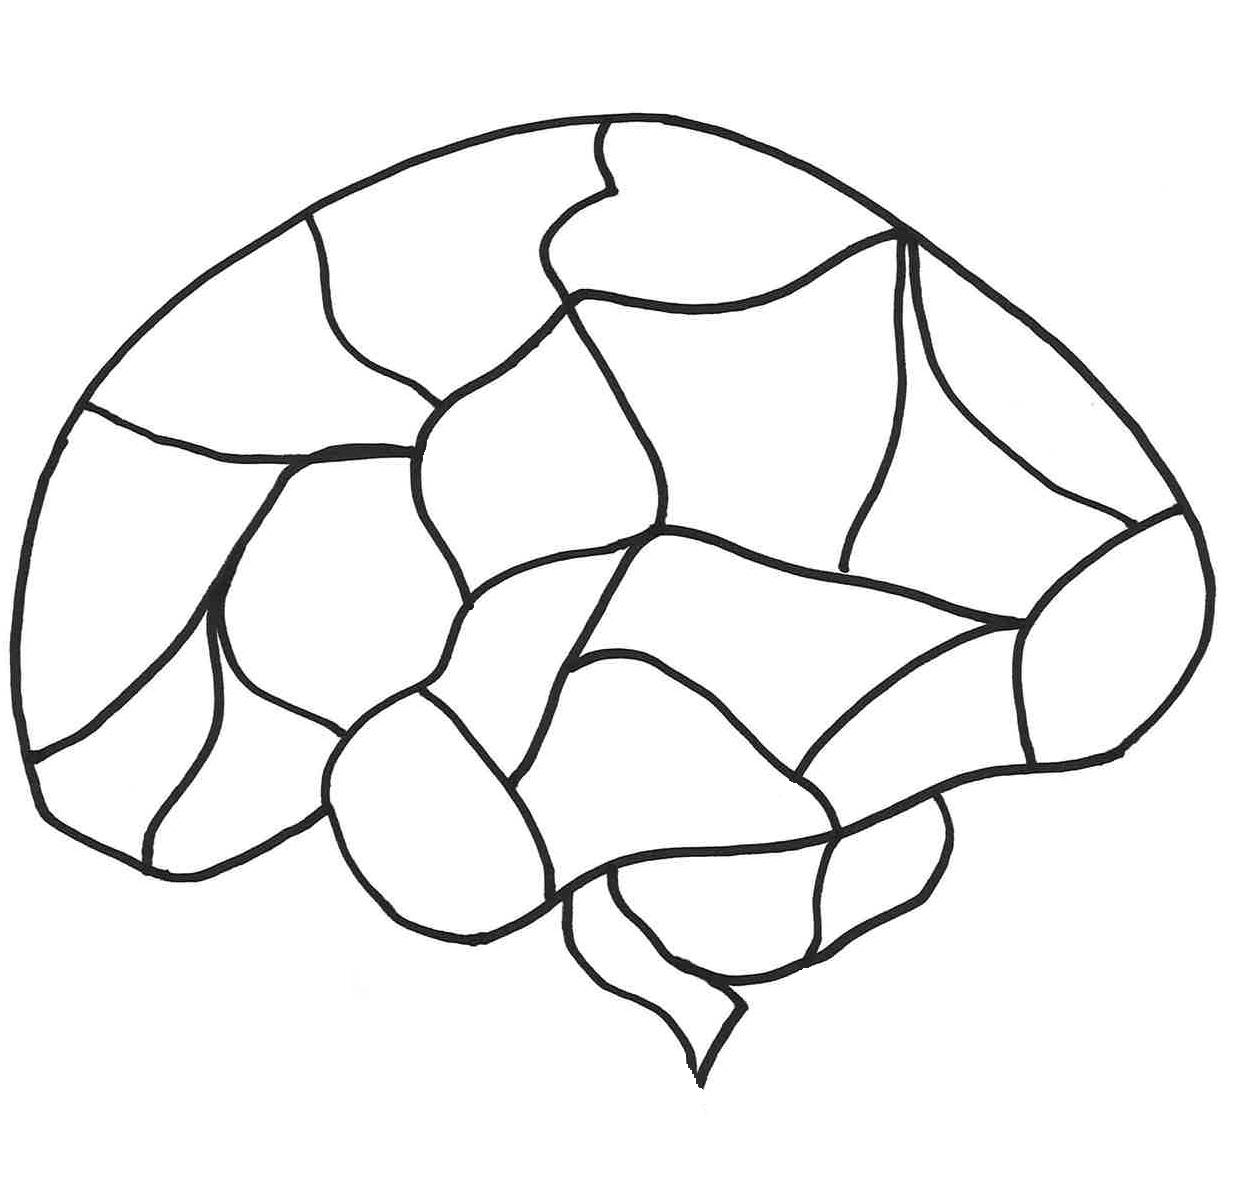 simple diagram of the brain lesson plan basic brain anatomy for